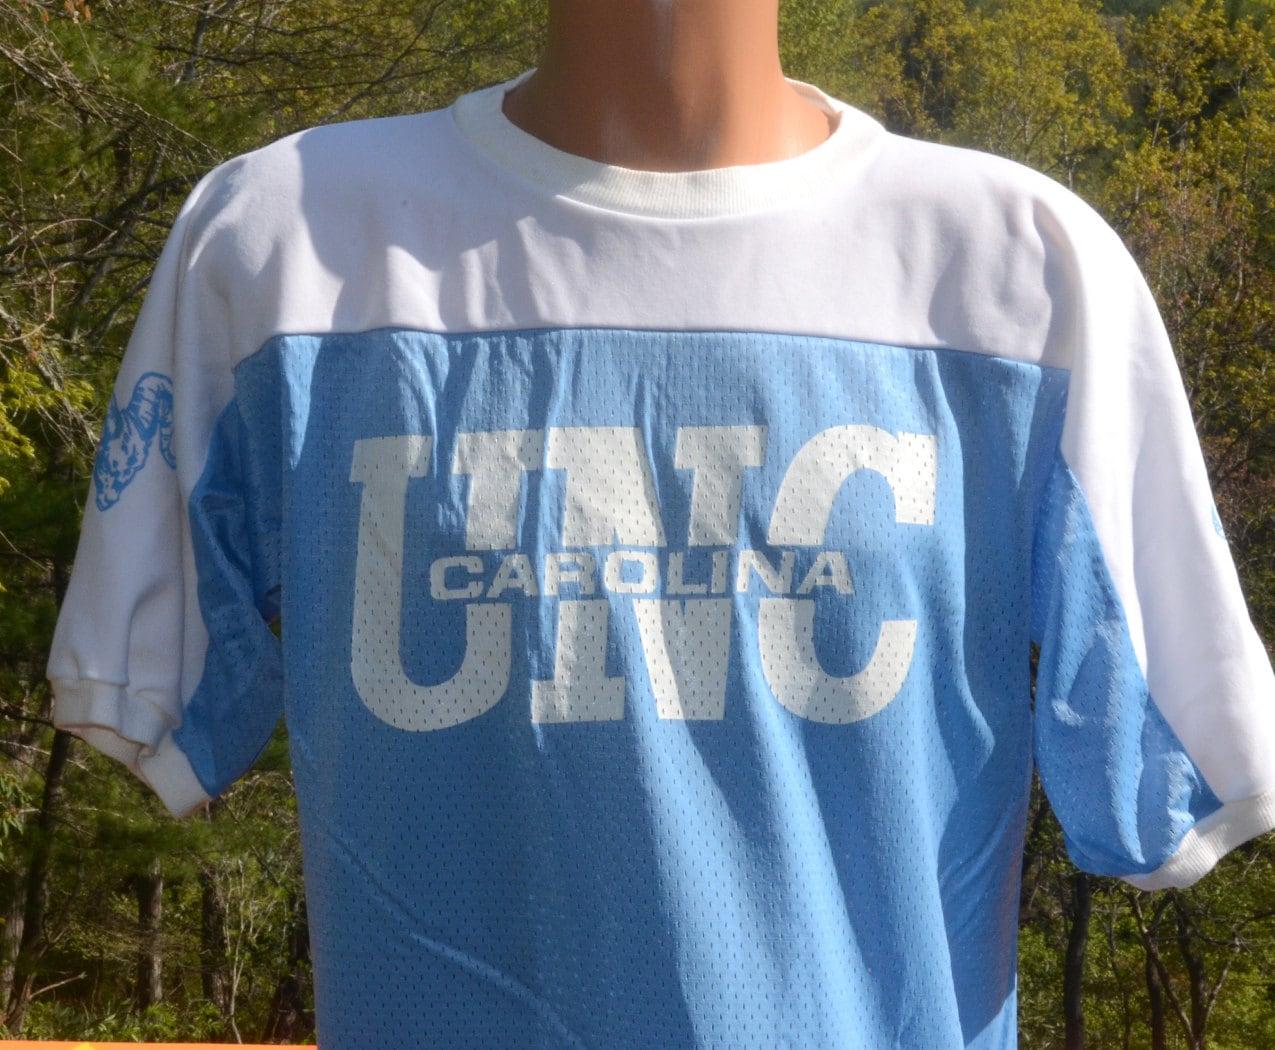 Vintage 70s unc t shirt tarheels basketball jersey university for University of north carolina t shirts